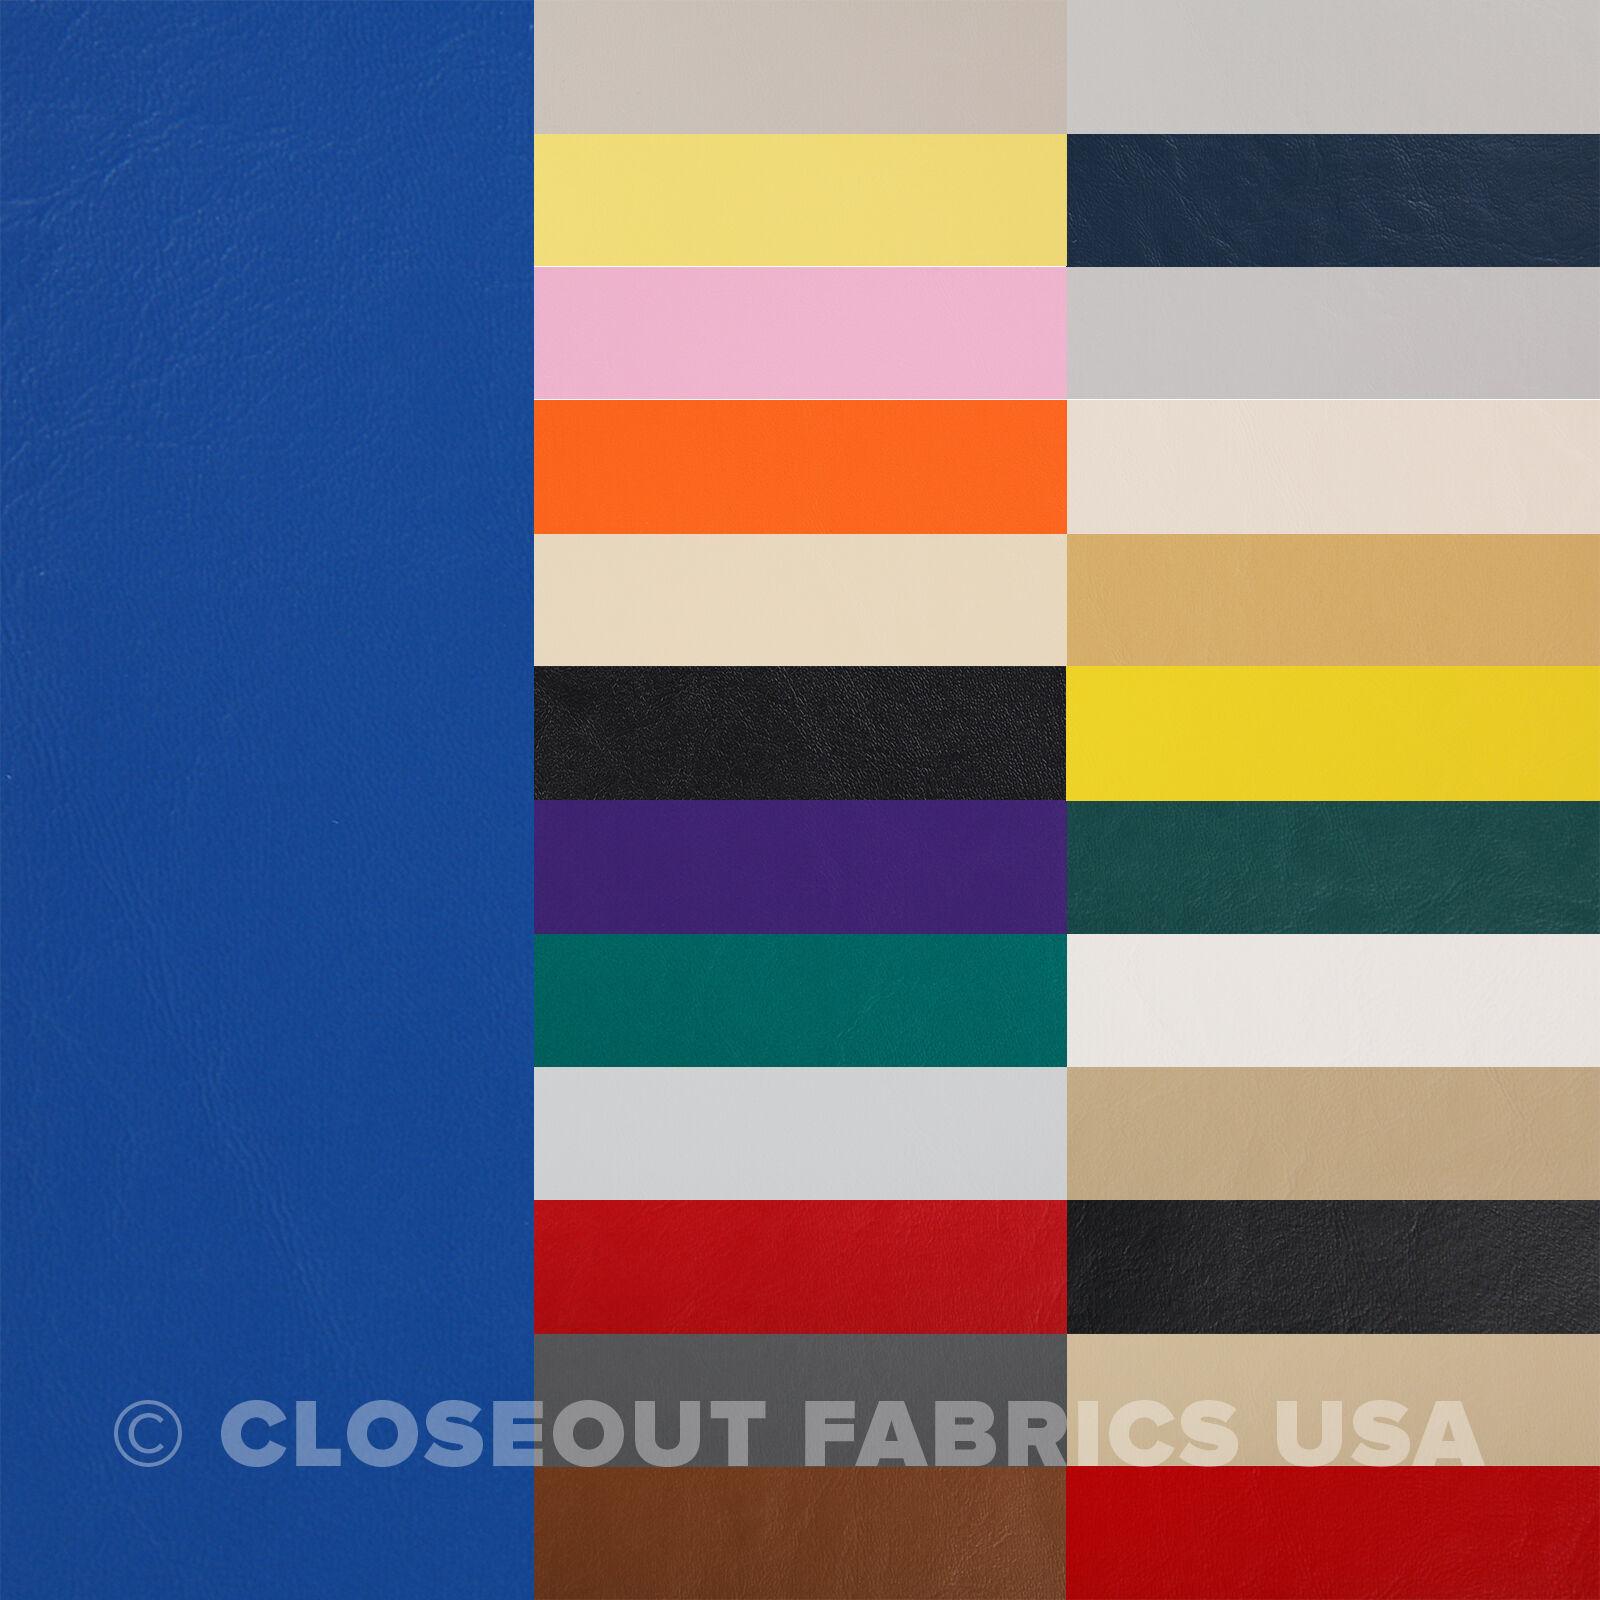 Marine Vinyl Fabric - Boat Auto Outdoor Upholstery - 33 Colo